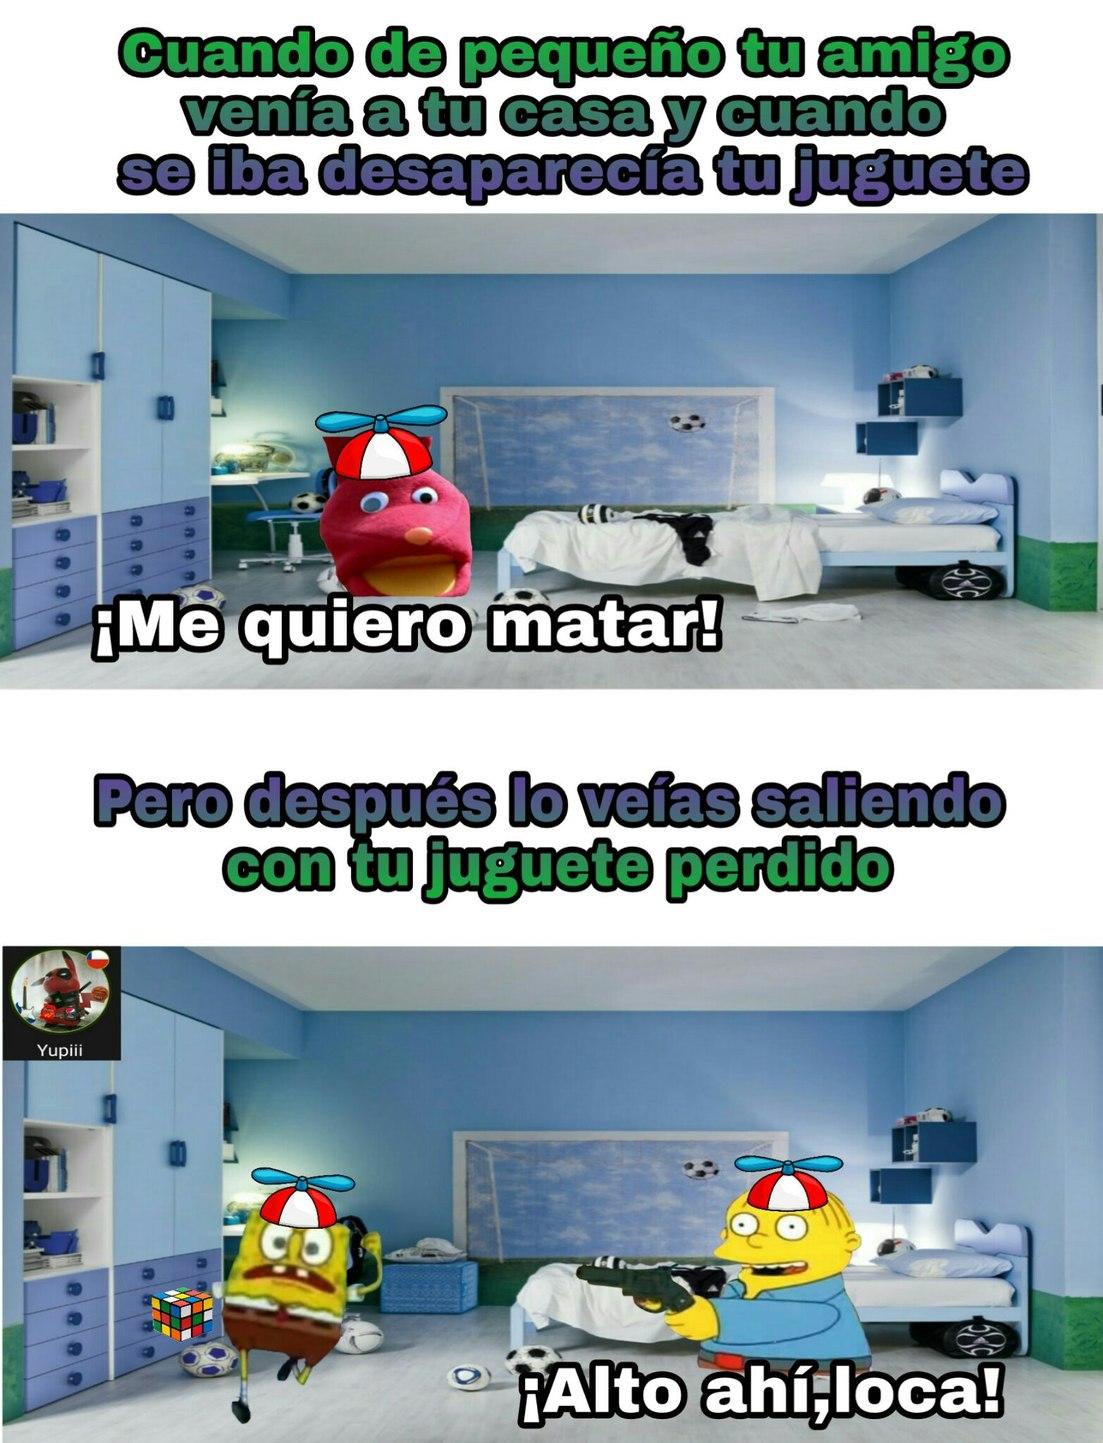 Meme :D